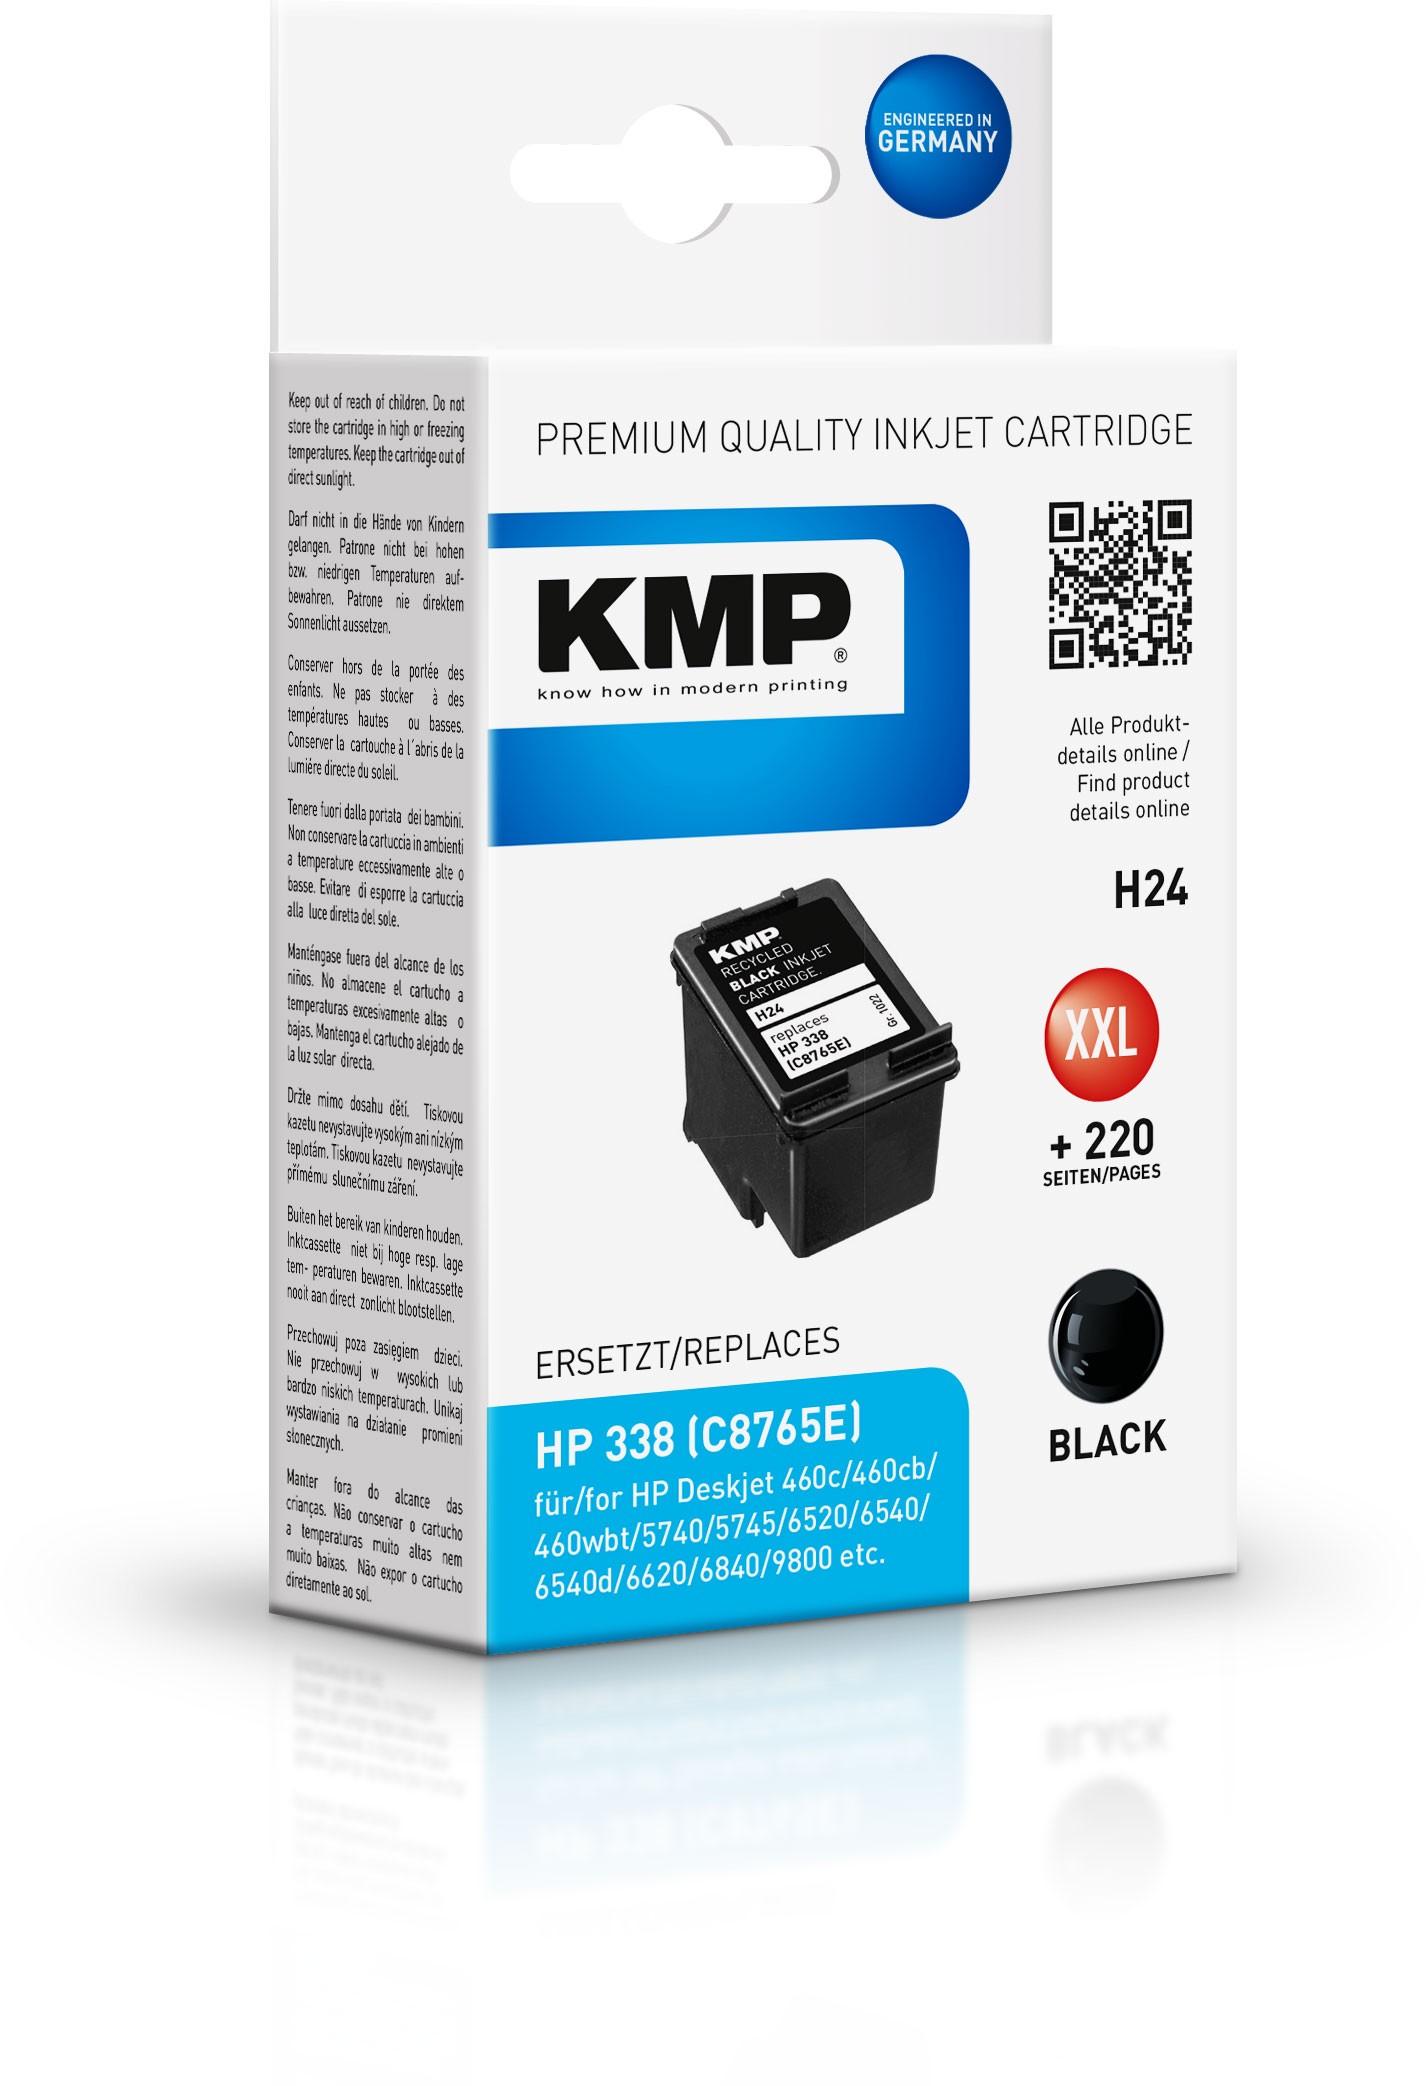 KMP Patrone H24 komp. zu HP 338 C8765E DeskJet 6540 9800 black